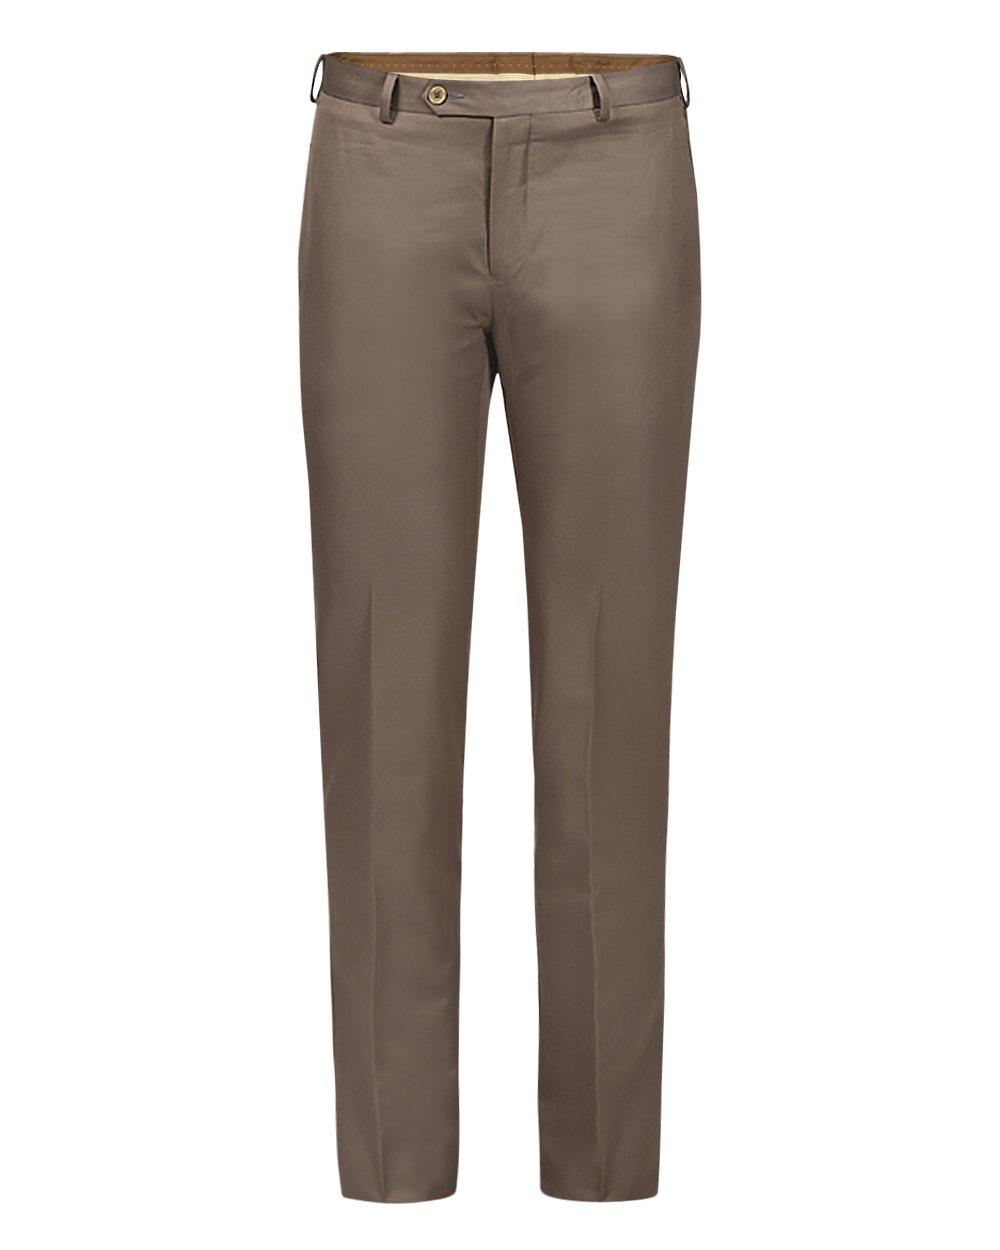 Raymond | Raymond Medium Fawn Trouser